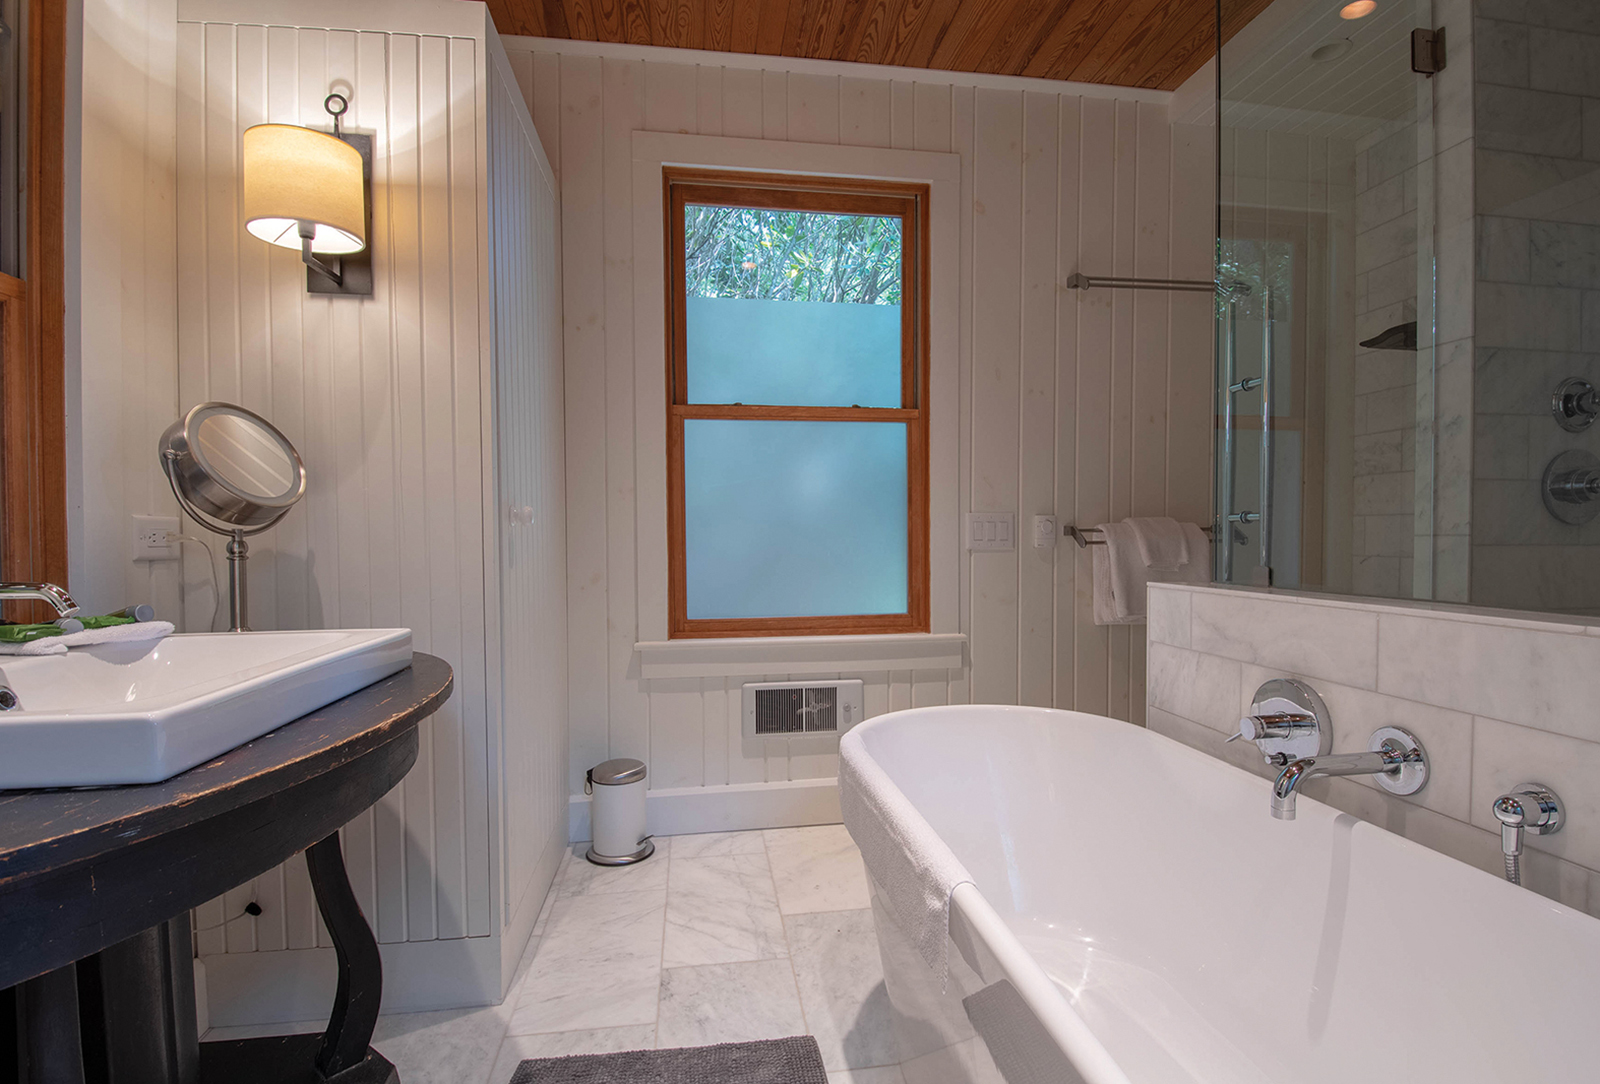 highlands nc home for sale bath